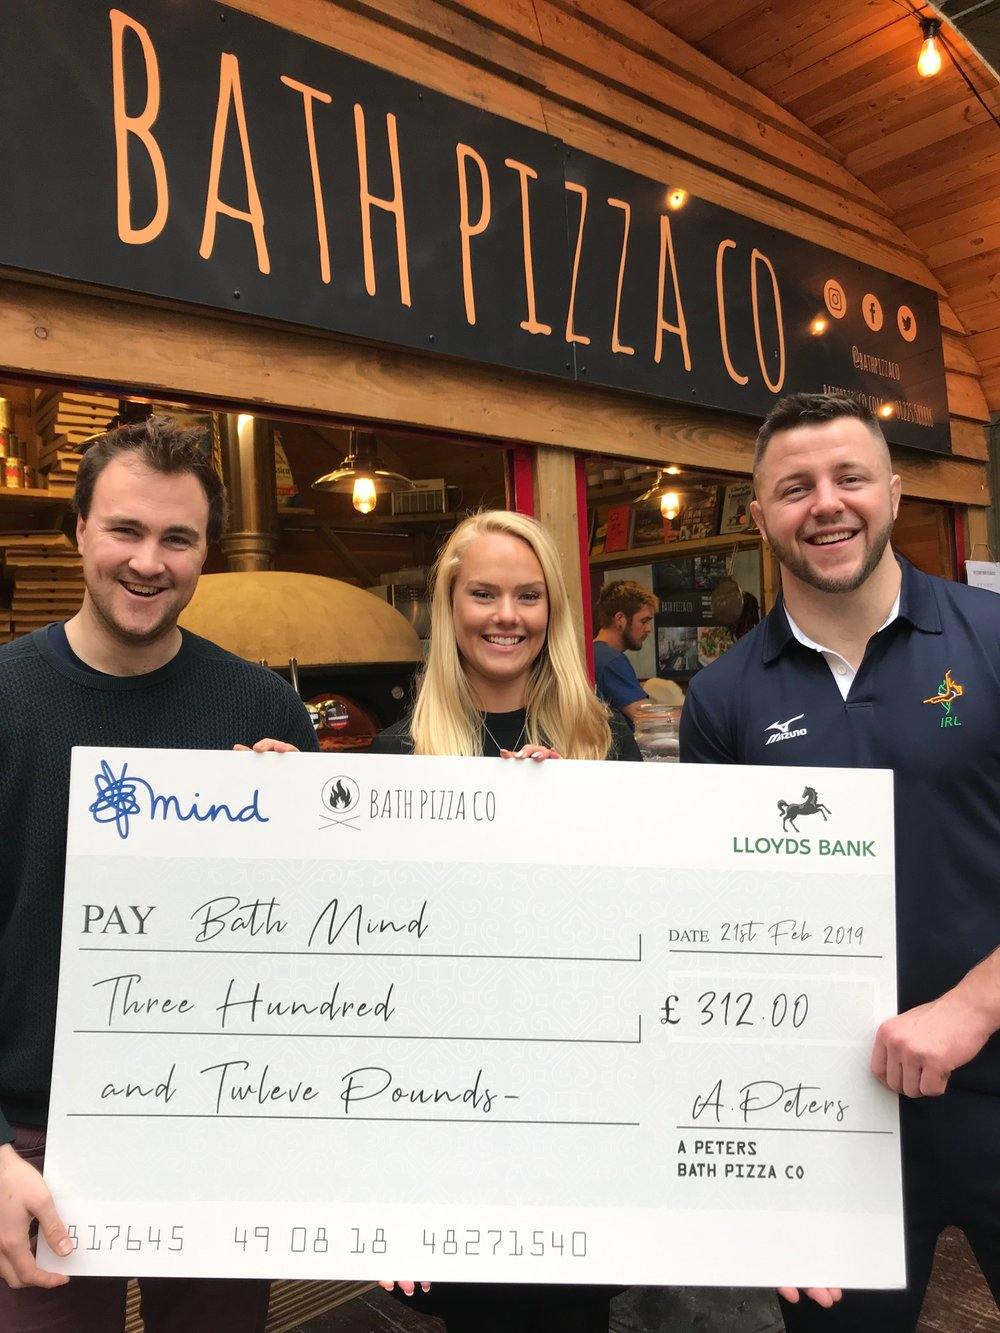 Left to right: Alex Peters (Bath Pizza Co), Hannah Roper (Bath Mind), Ben Fletcher (Olympic Judoka)